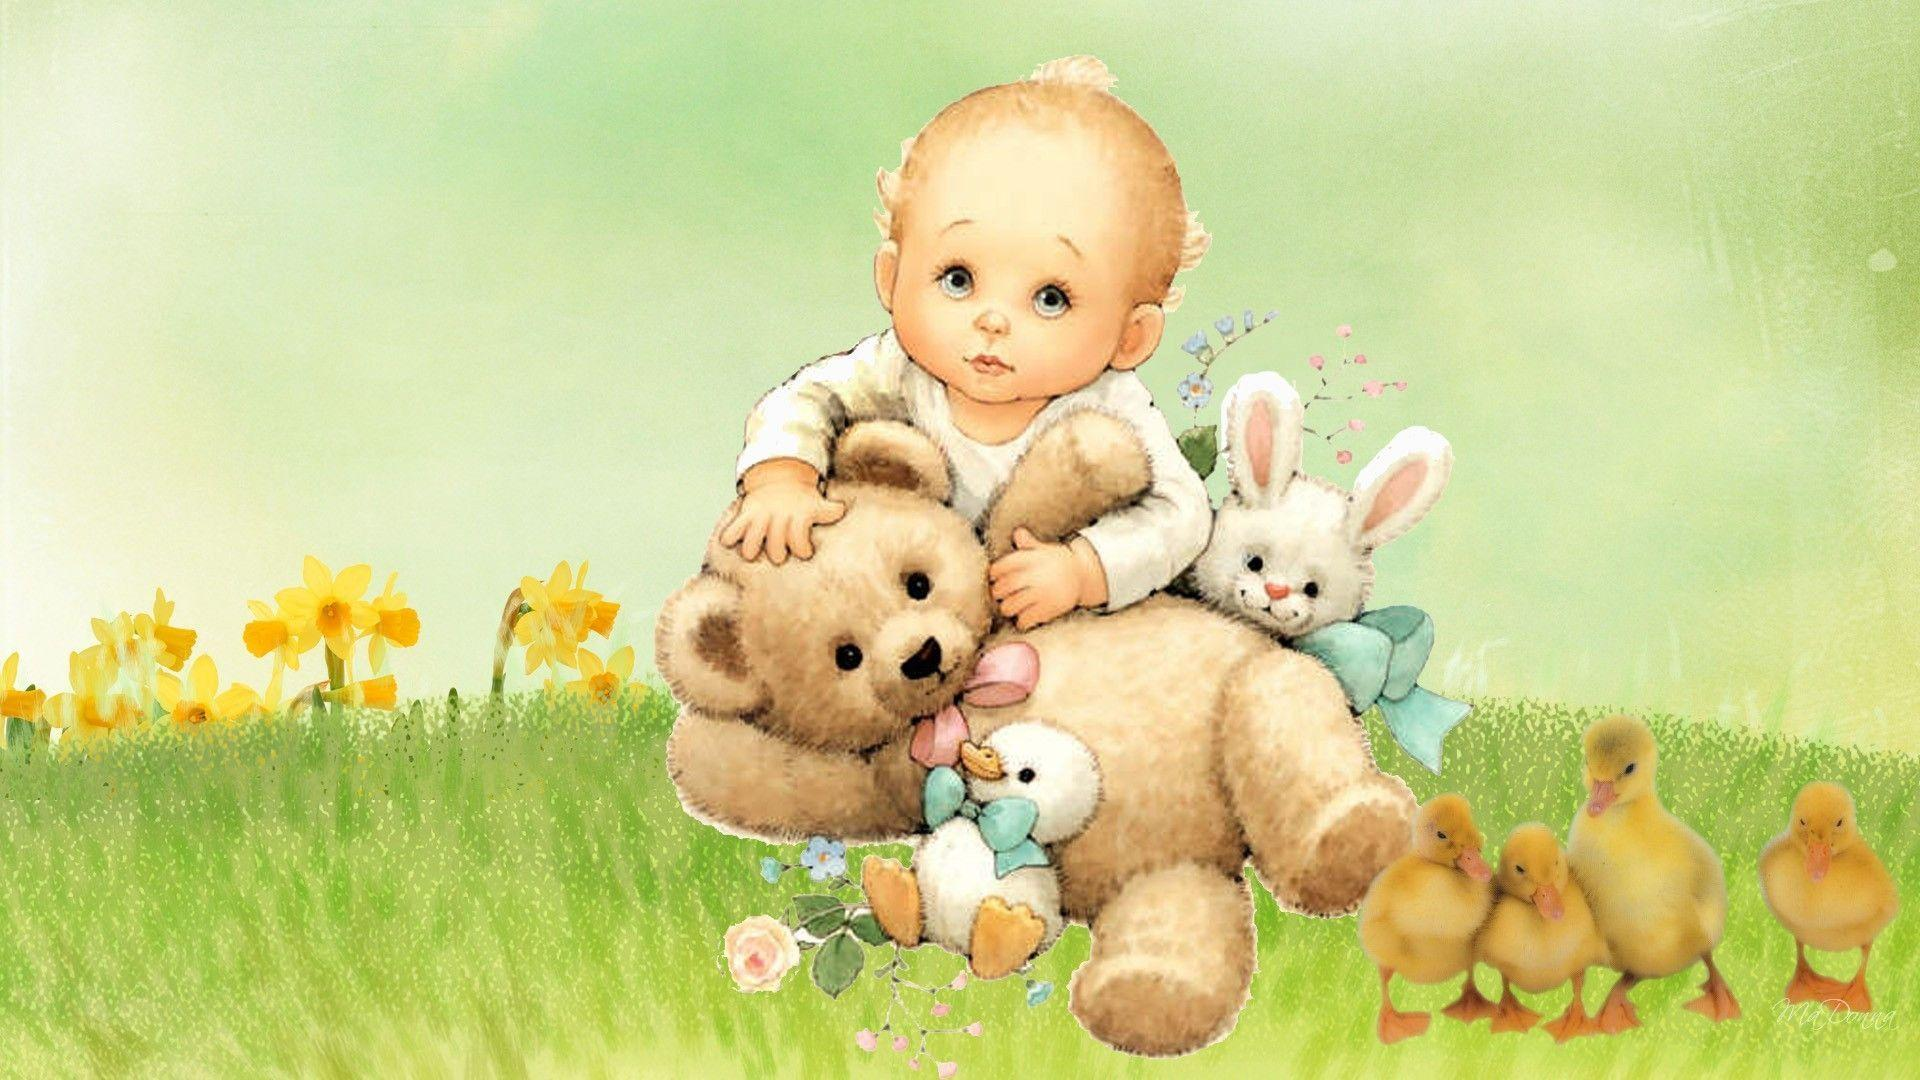 Cute Love Teddy Bears Wallpapers Teddy Bear Love Wallpapers Wallpaper Cave